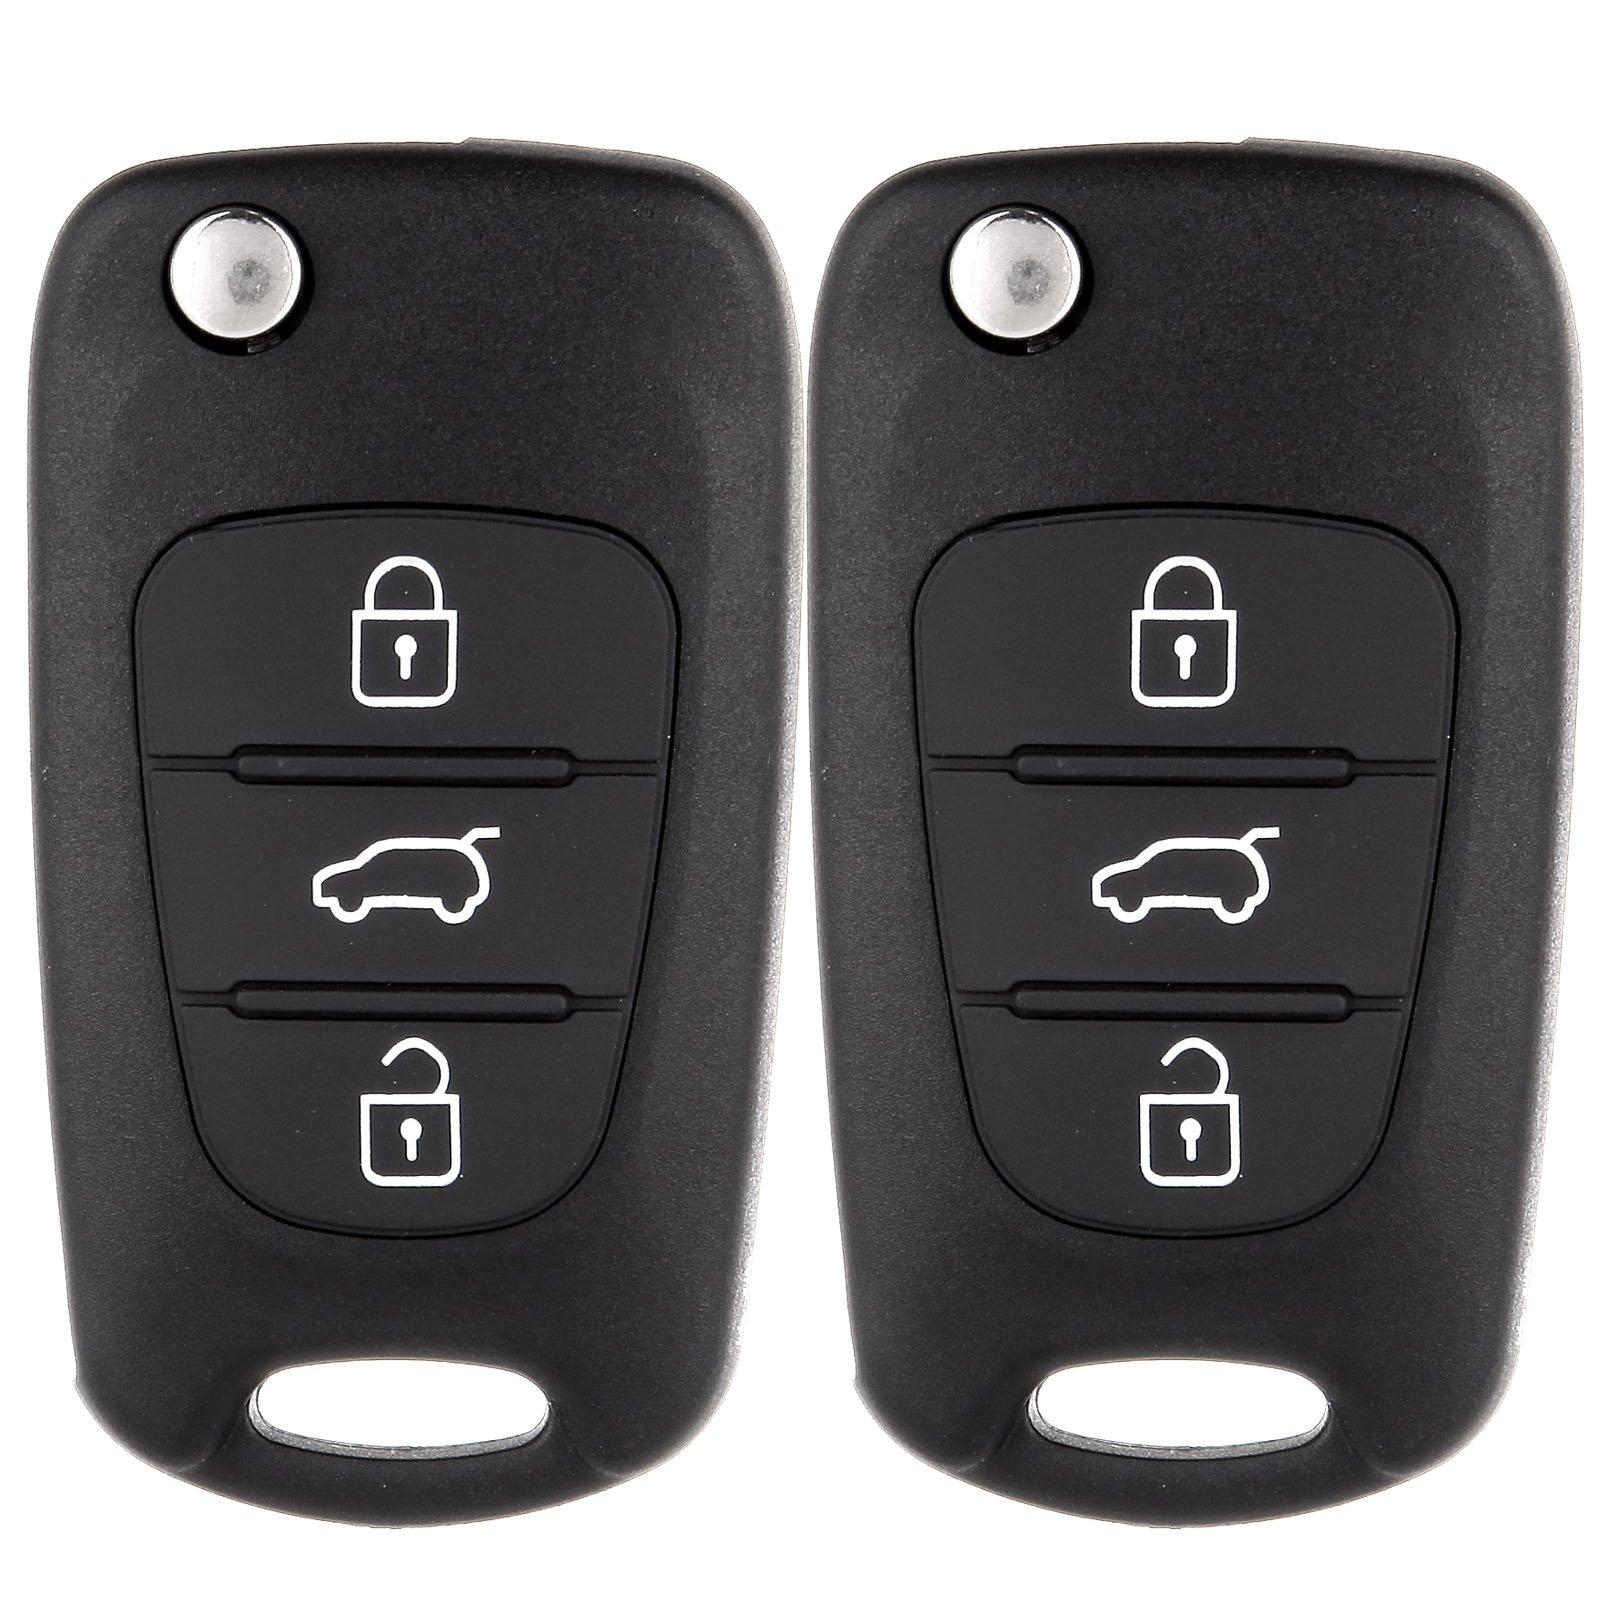 2 Button Car Remote Key Shell Case Fob Fit for KIA Sportage 2005-2010